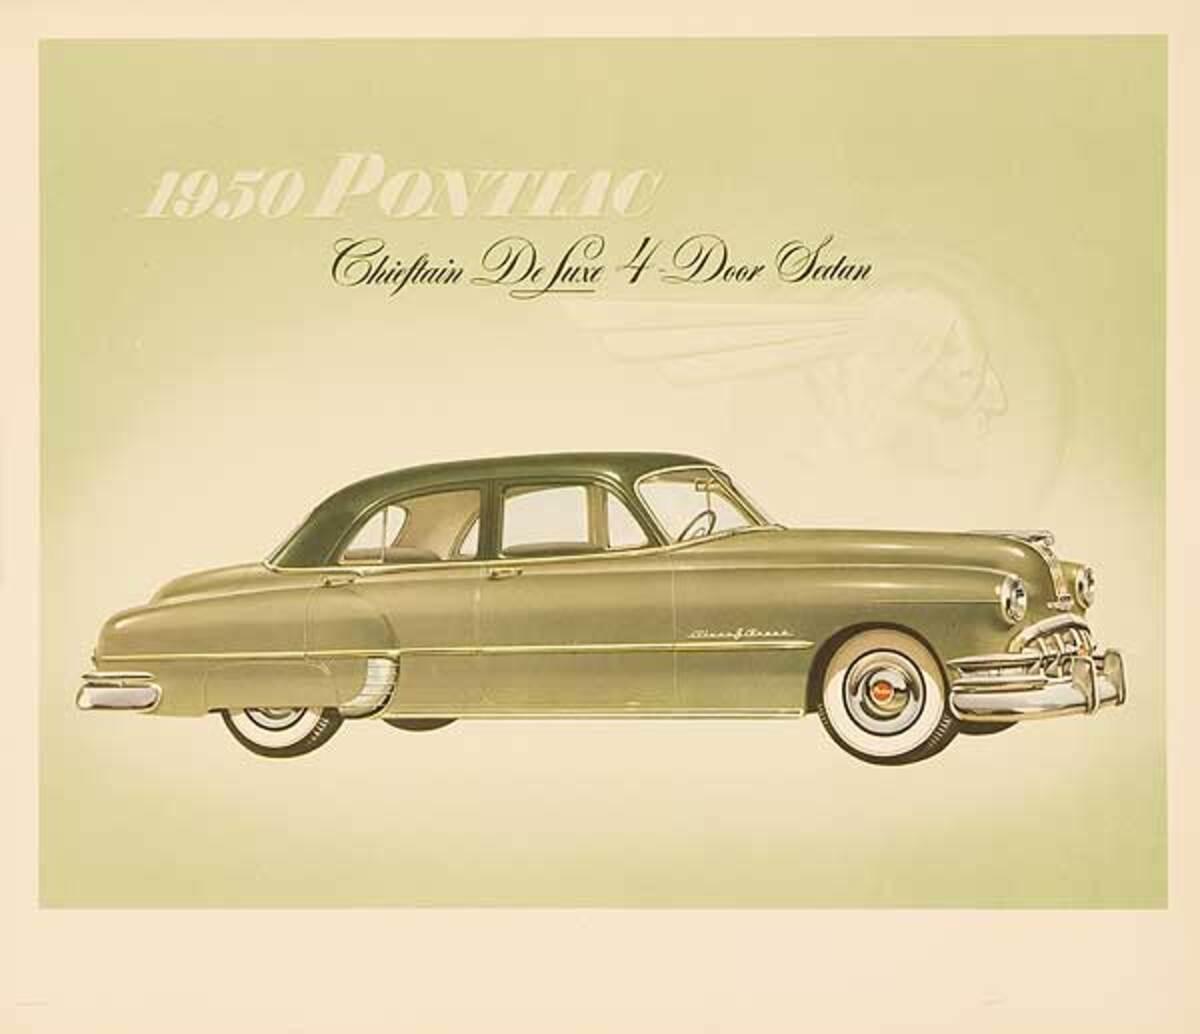 1950 Pontiac Chieftan Deluxw 4 Door Sedan Original Showroom Advertising Poster